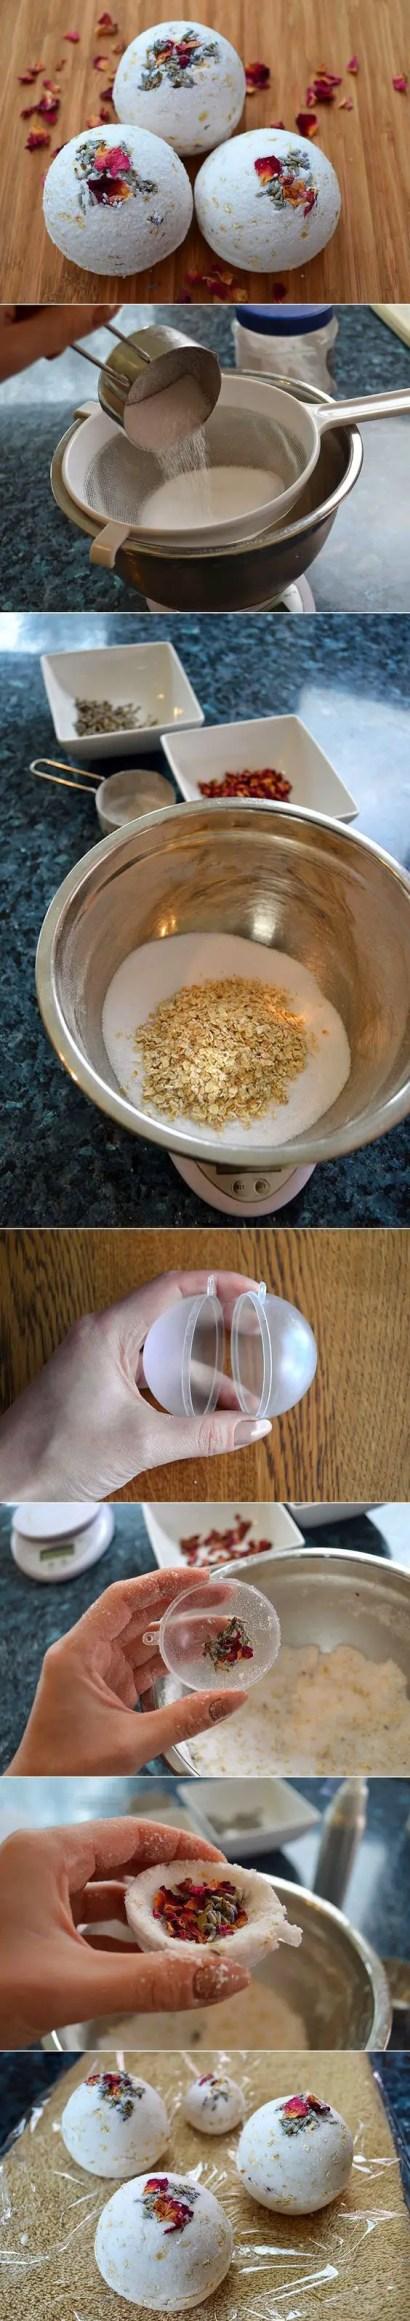 oatmeal bath bombs recipe